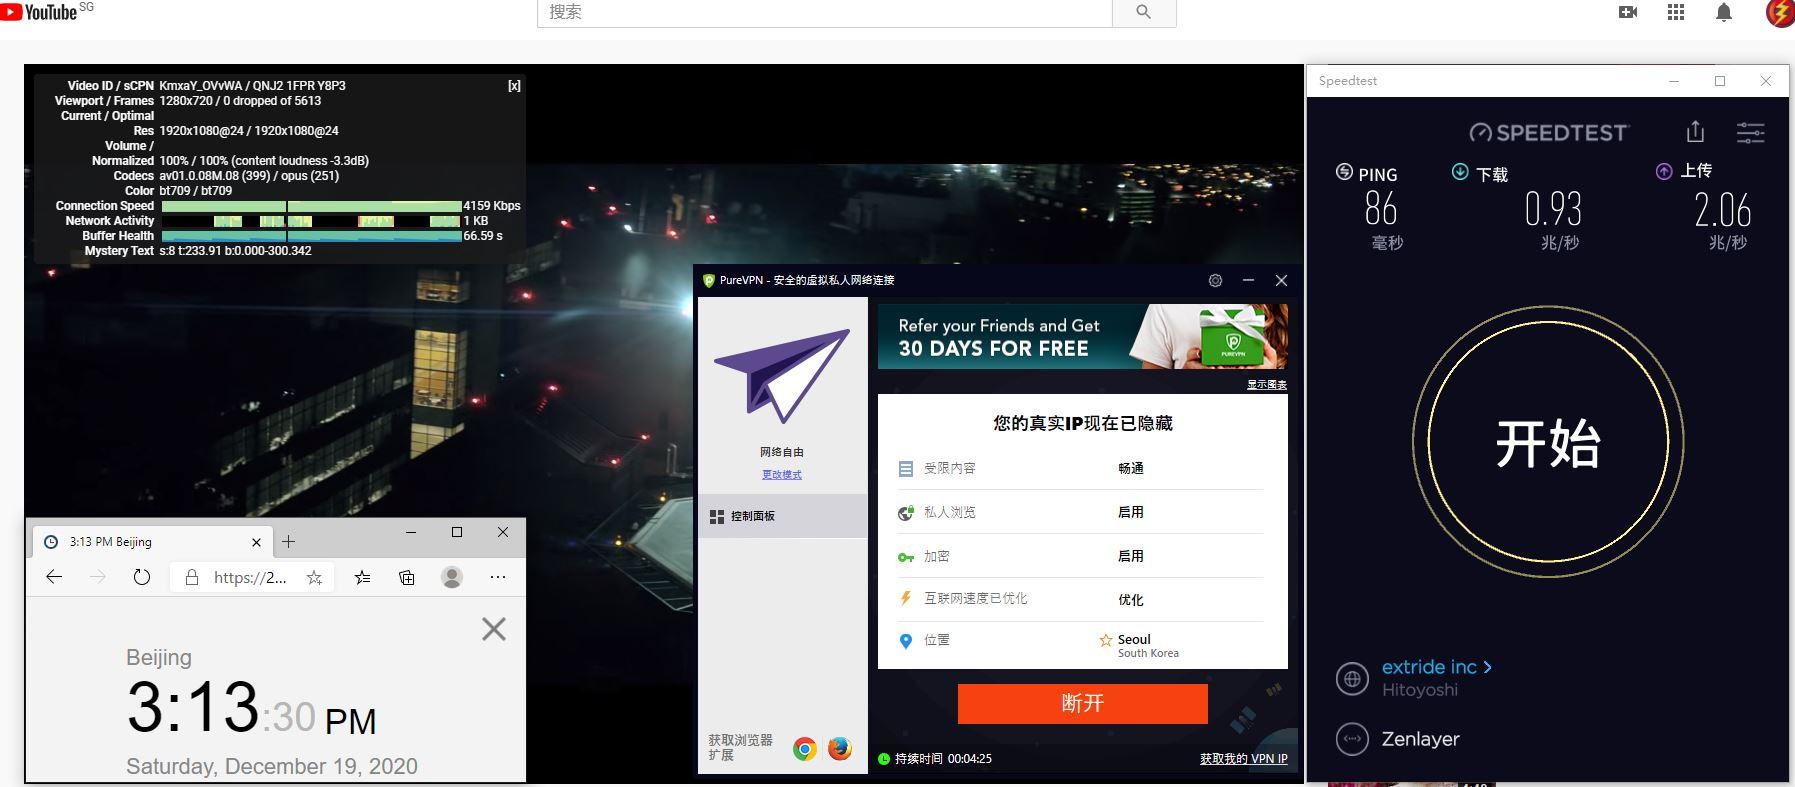 Windows10 PureVPN South Korea 服务器 中国VPN 翻墙 科学上网 测试 - 20201219